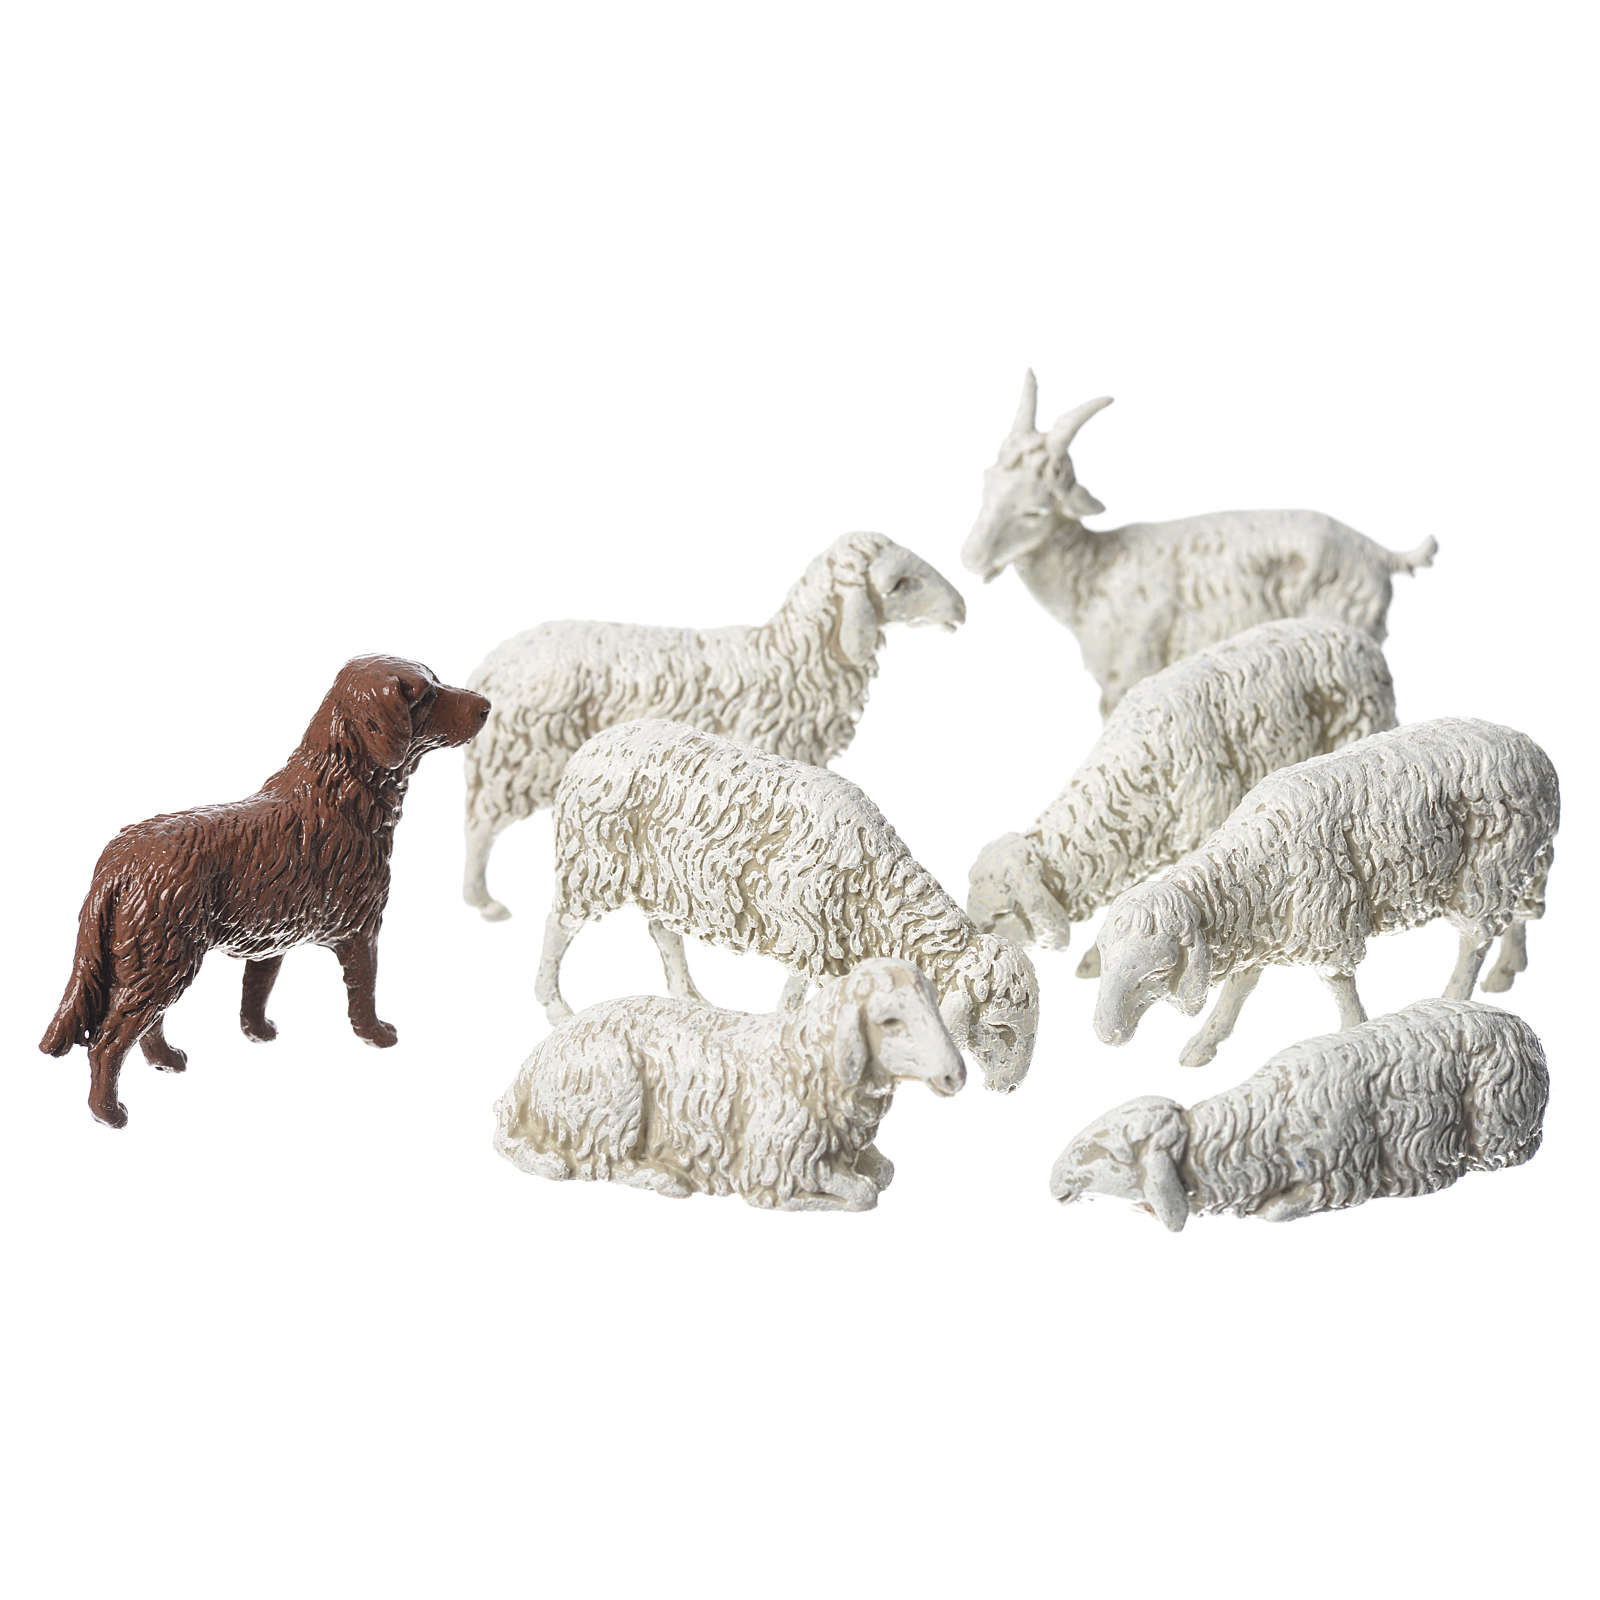 Koza pies i owce 8 szt. Moranduzzo 10 cm 4